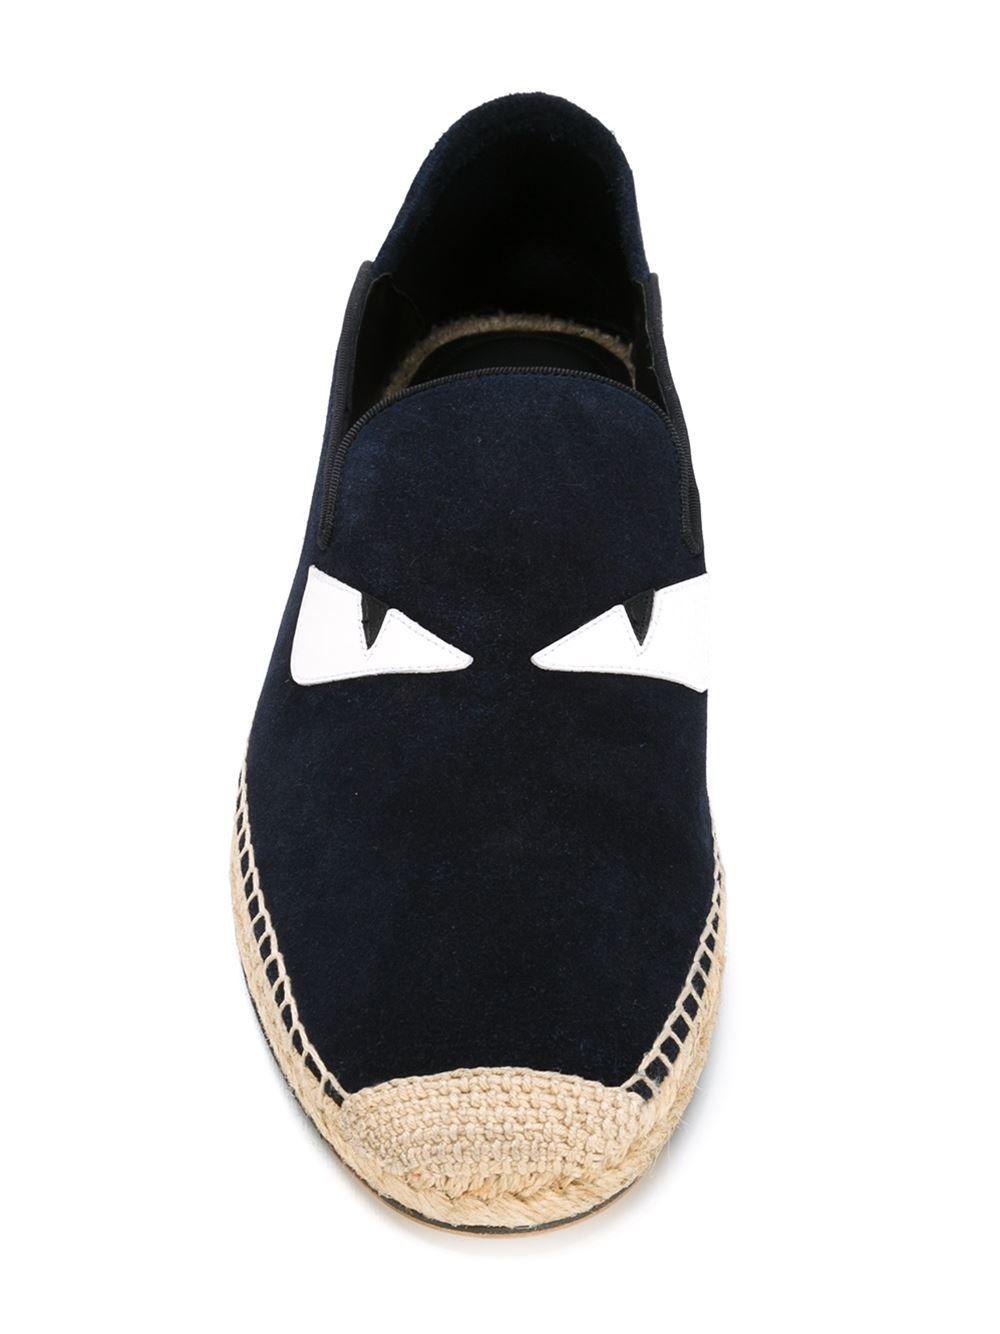 6cd9cec88b4602  fendi  shoes  bagbugs  navy  espadrilles  men  fashion www.